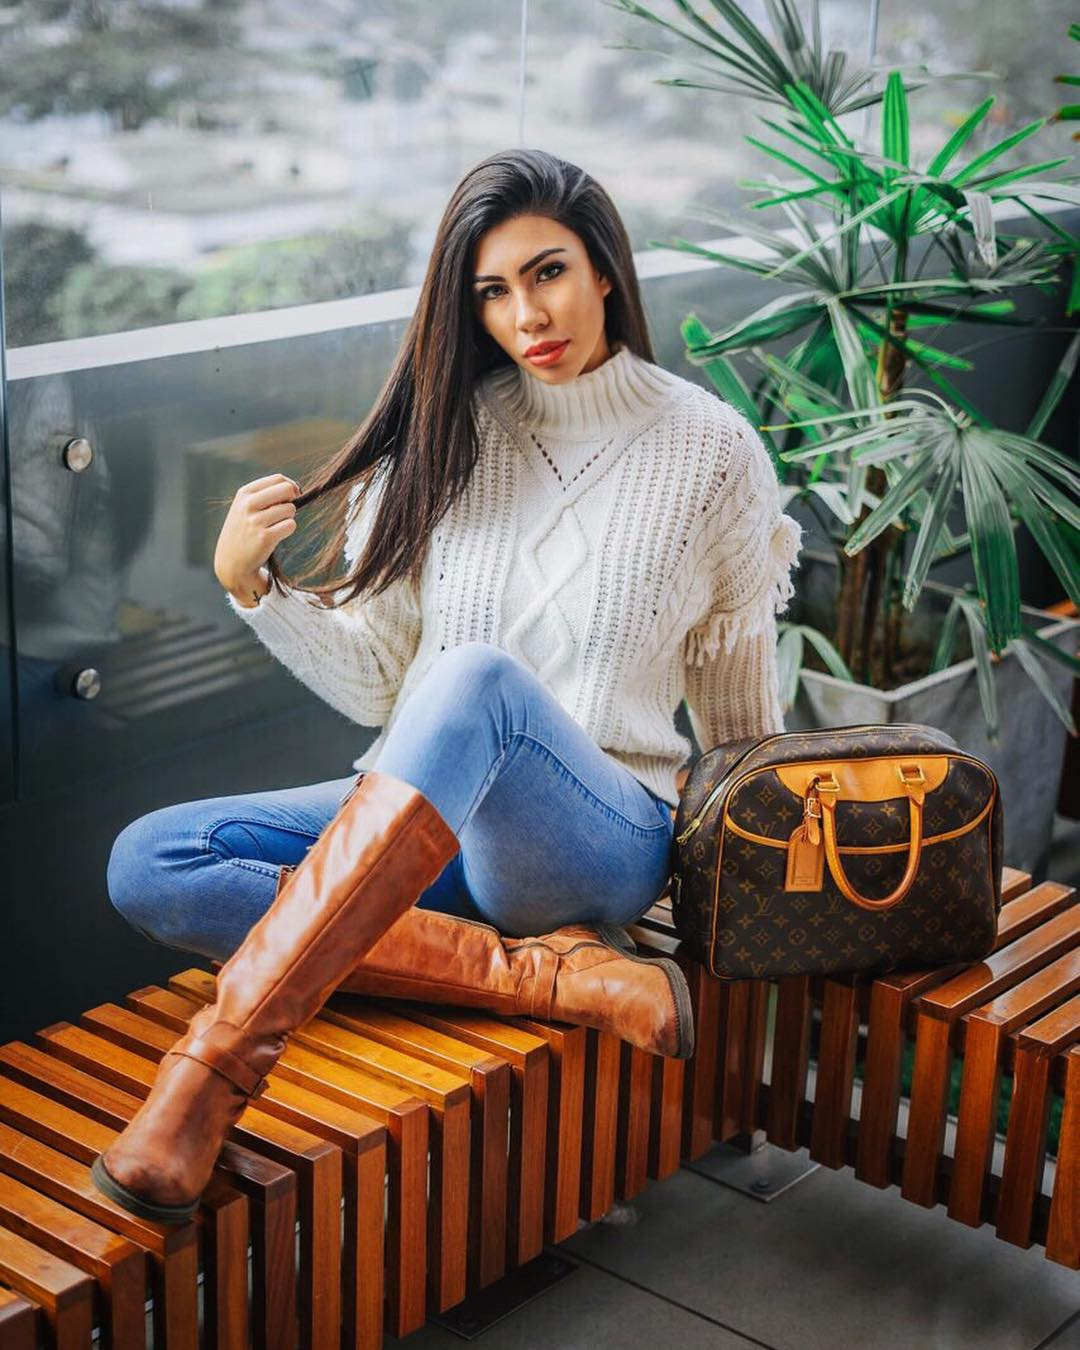 giuliana valenzuela, miss intercontinental peru 2018-2019. 41911710